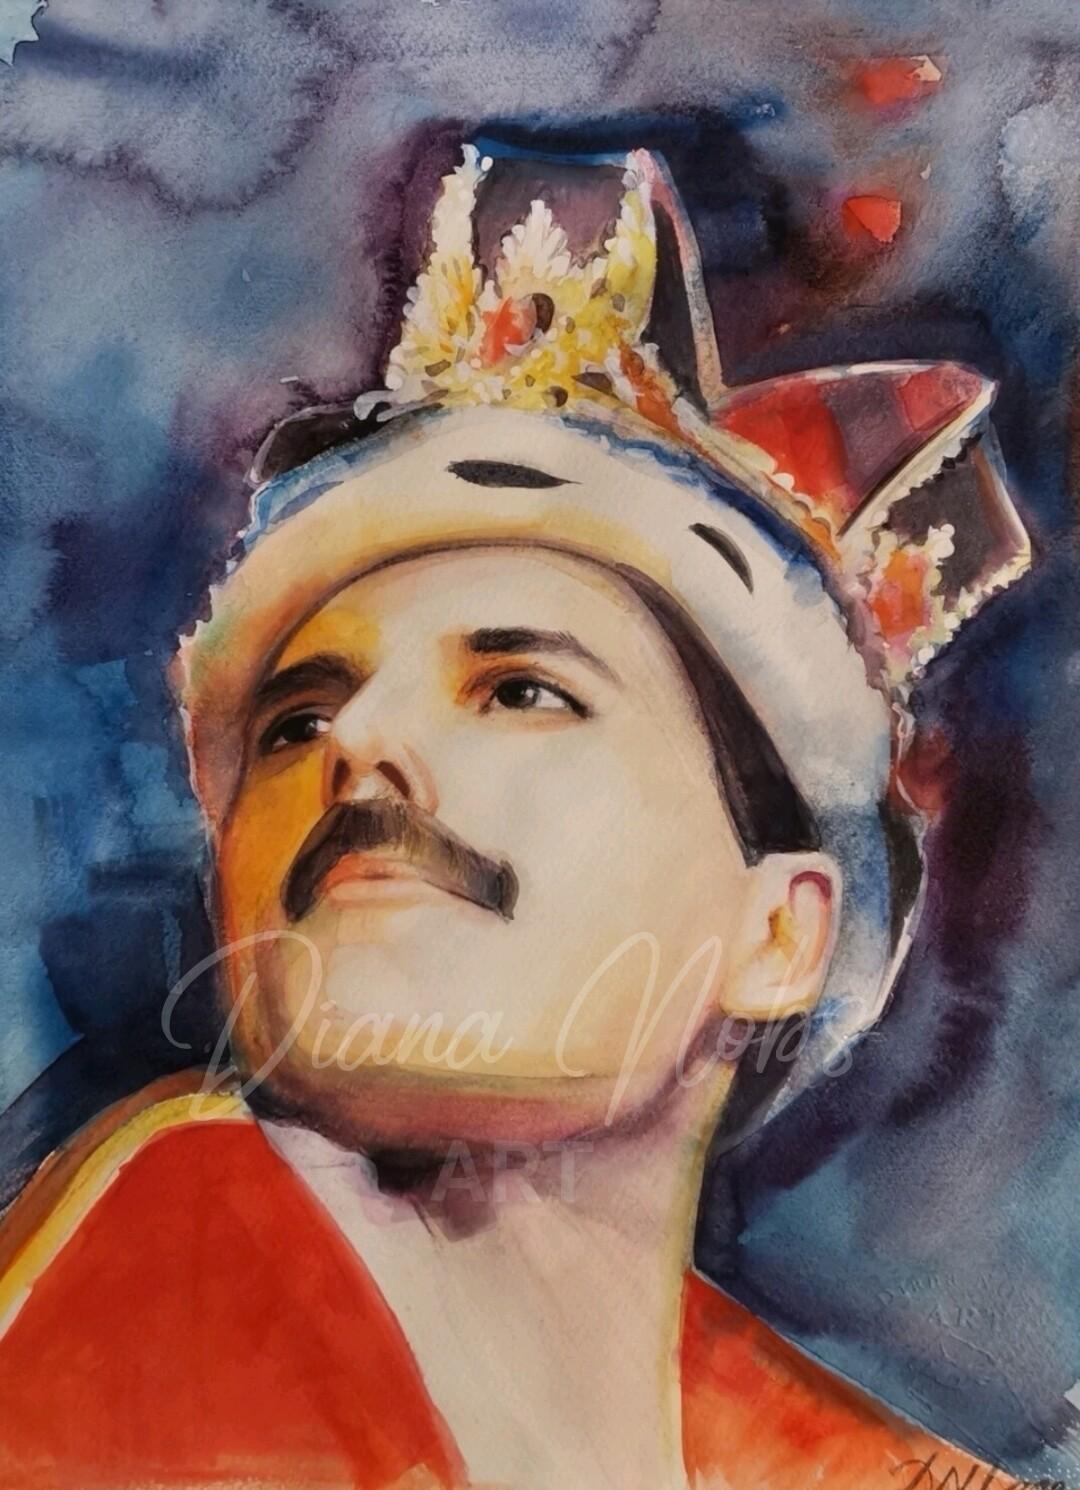 The portrait of Freddie Mercury /Limited edition 1/100